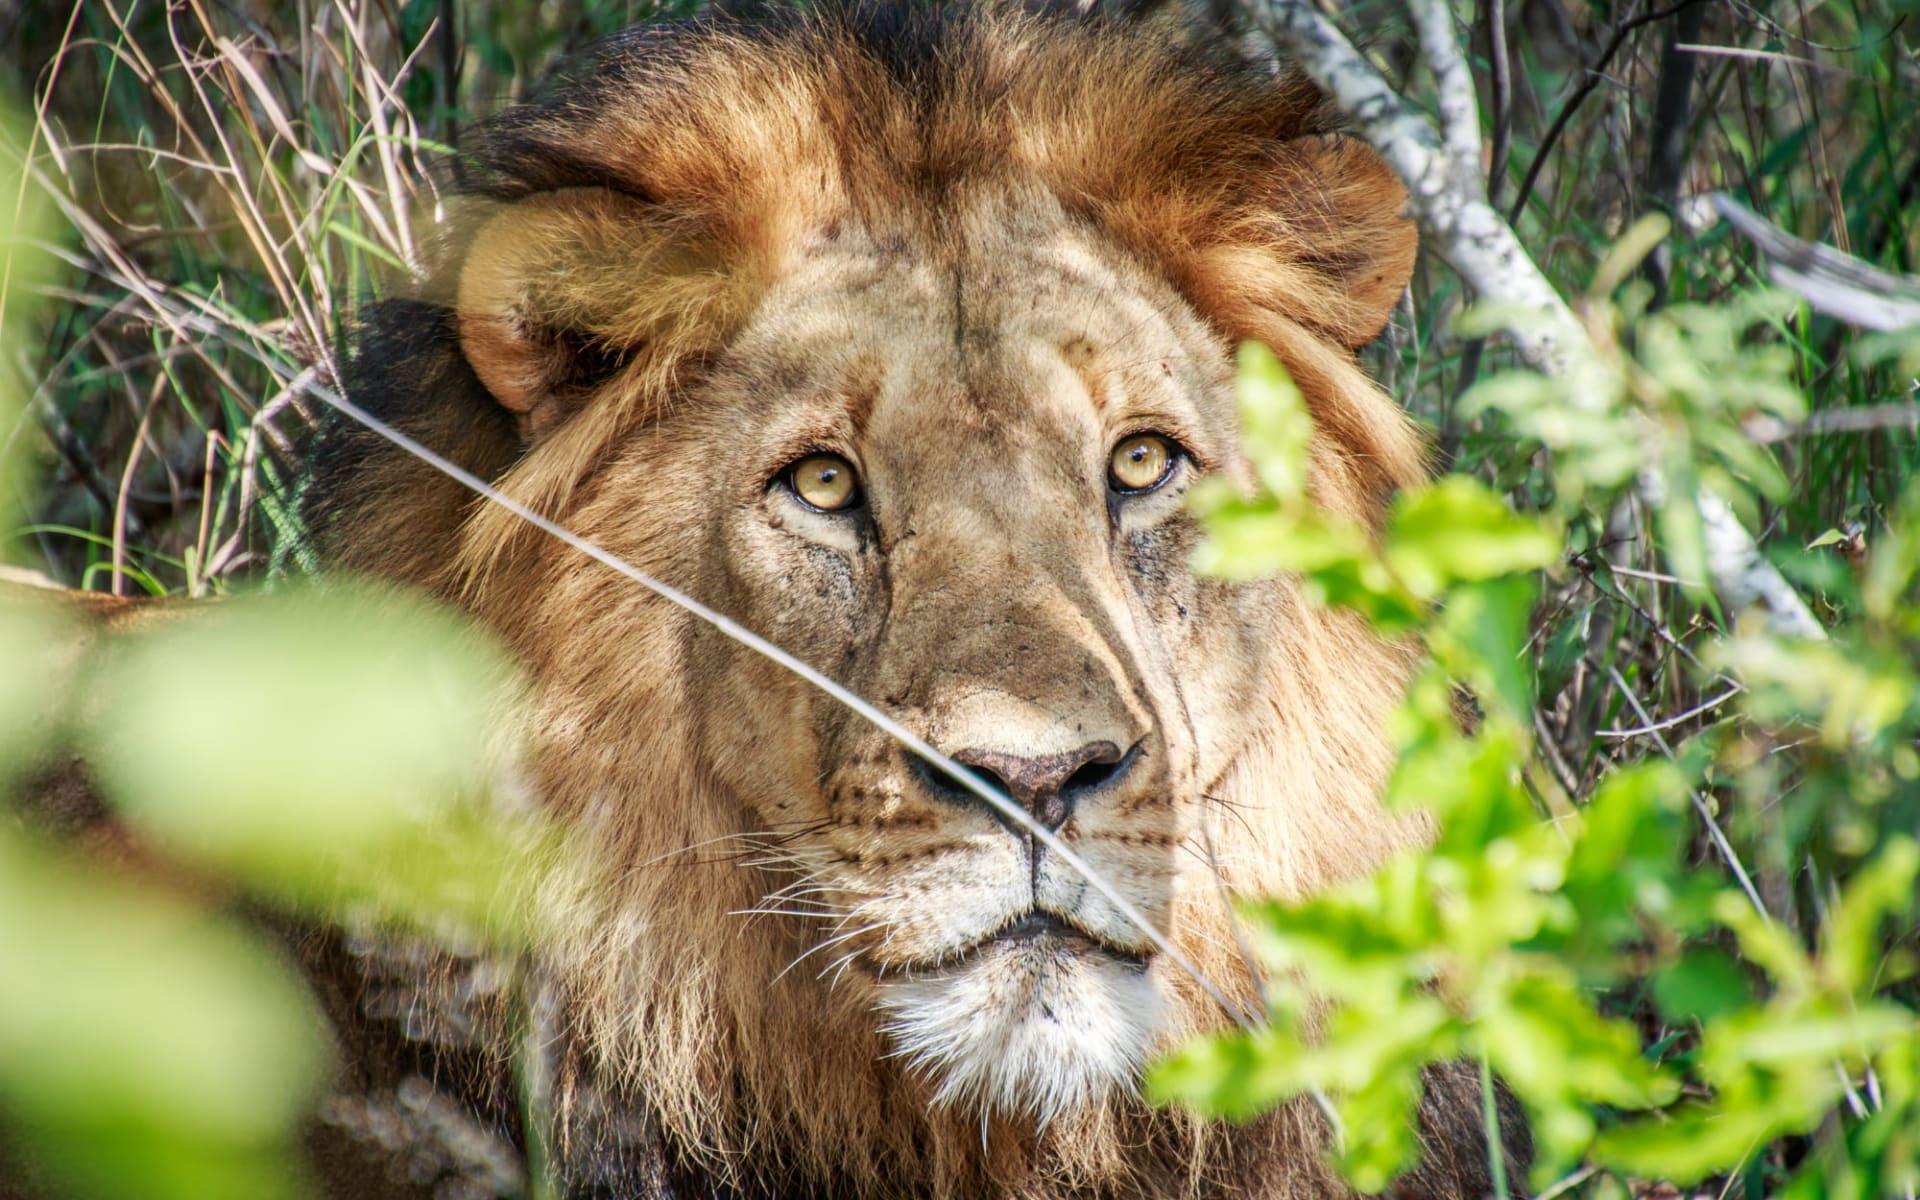 Krüger Nationalpark (Südafrika) & Mozambique ab Johannesburg: Südafrika - Krüger Nationalpark - Löwe